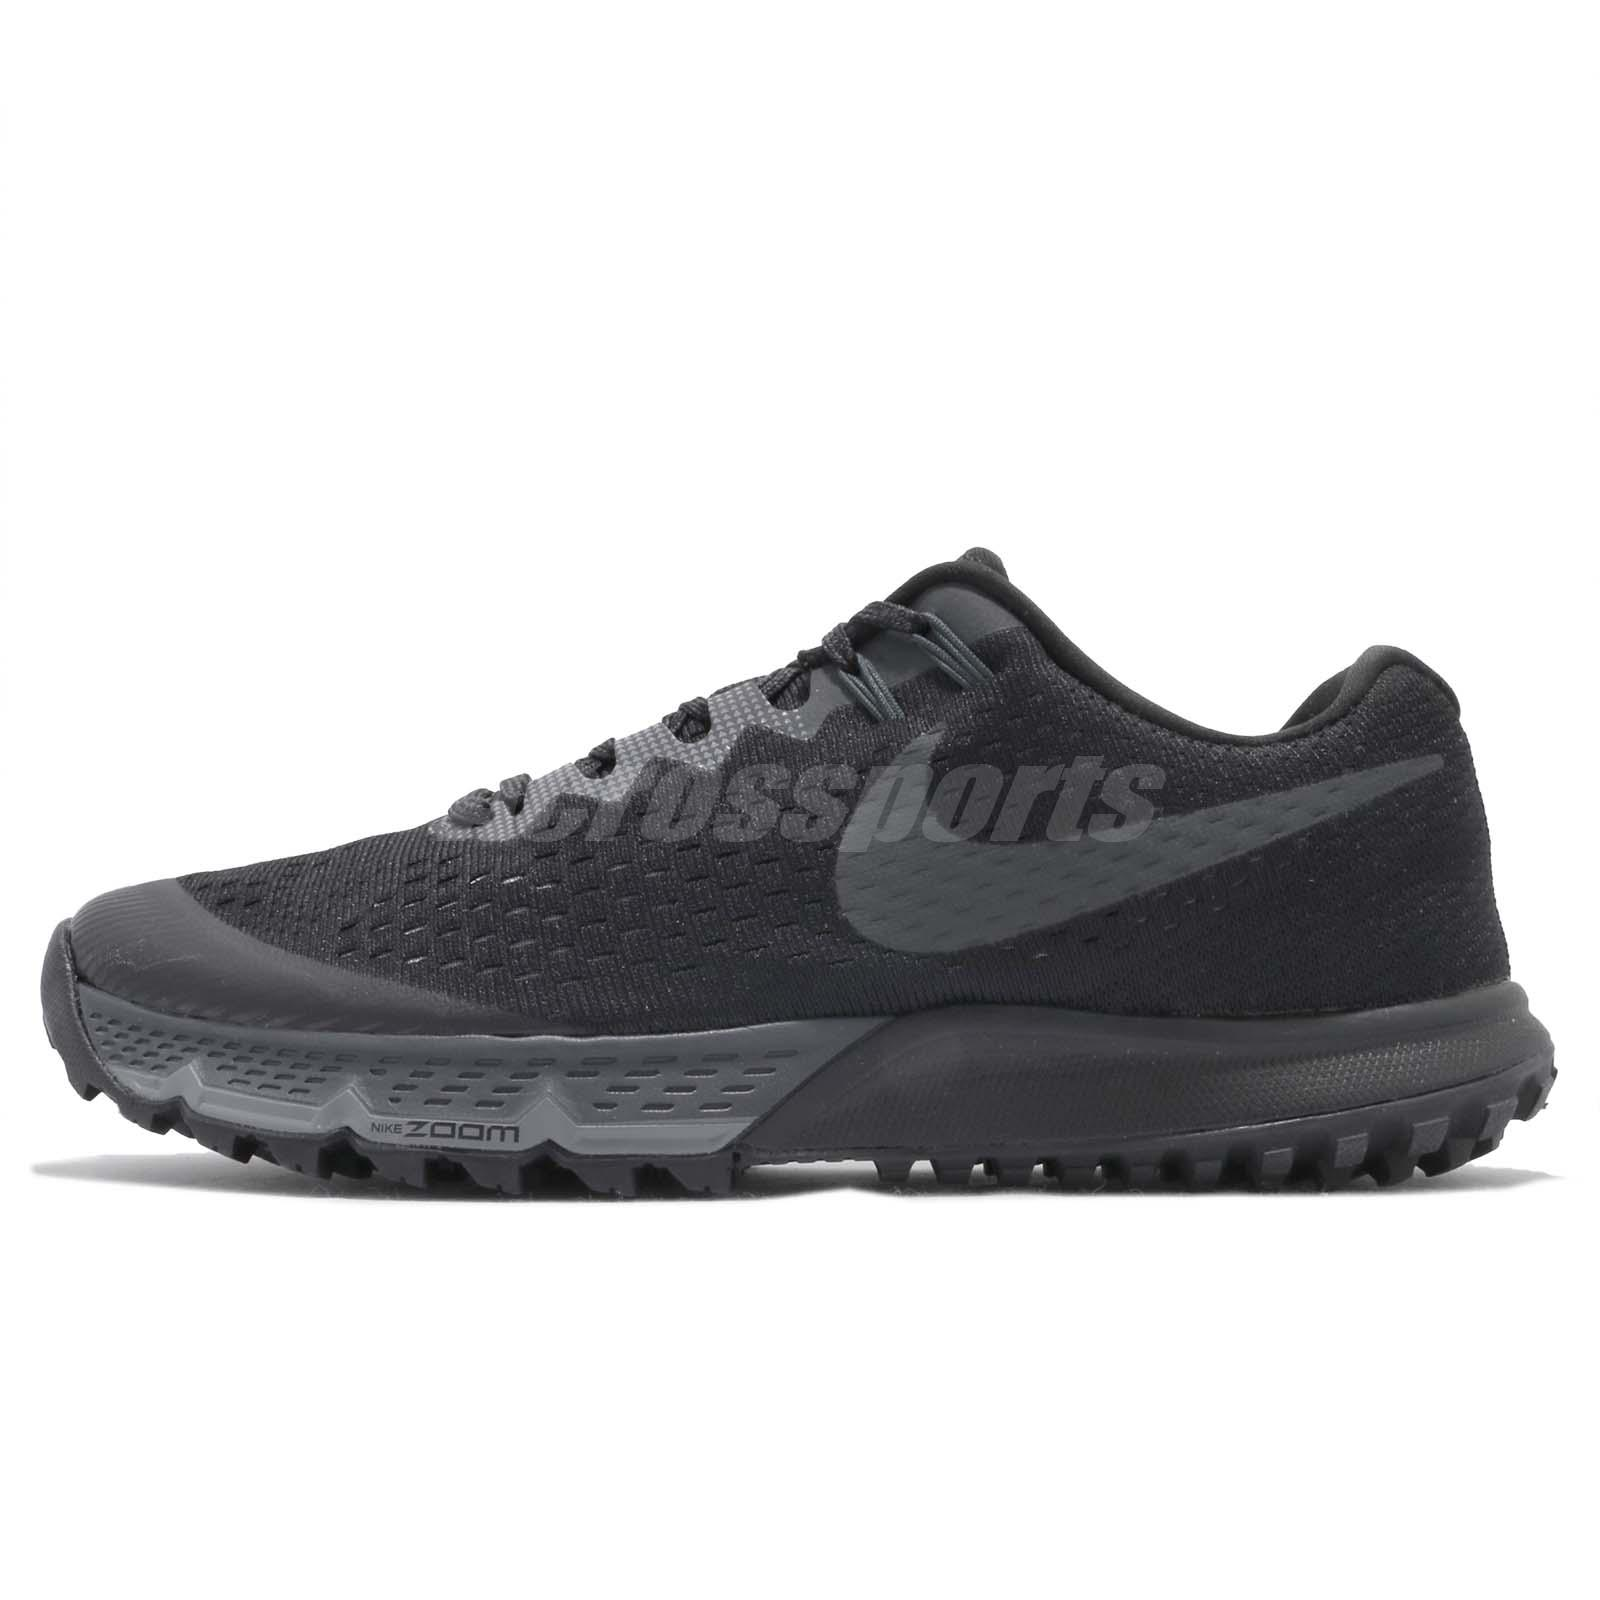 b35528021f3 Nike Air Zoom Terra Kiger 4 IV Black Men Trail Running Shoes Sneakers 880563 -010